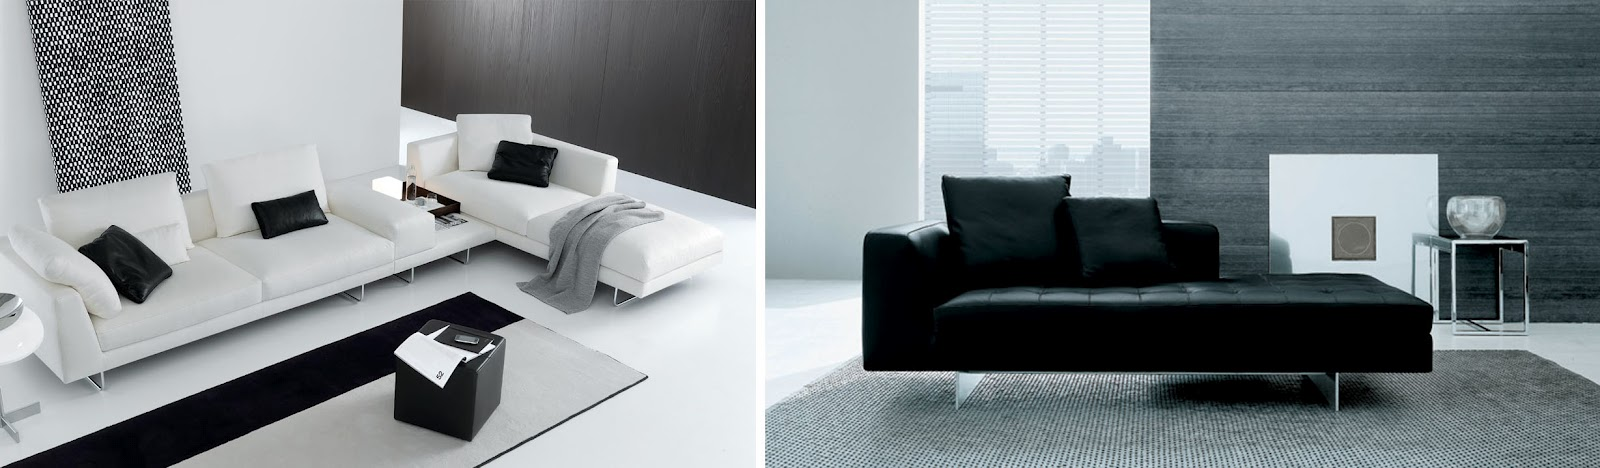 Sal n comedor minimalista redise a tu mundo for Salon comedor minimalista